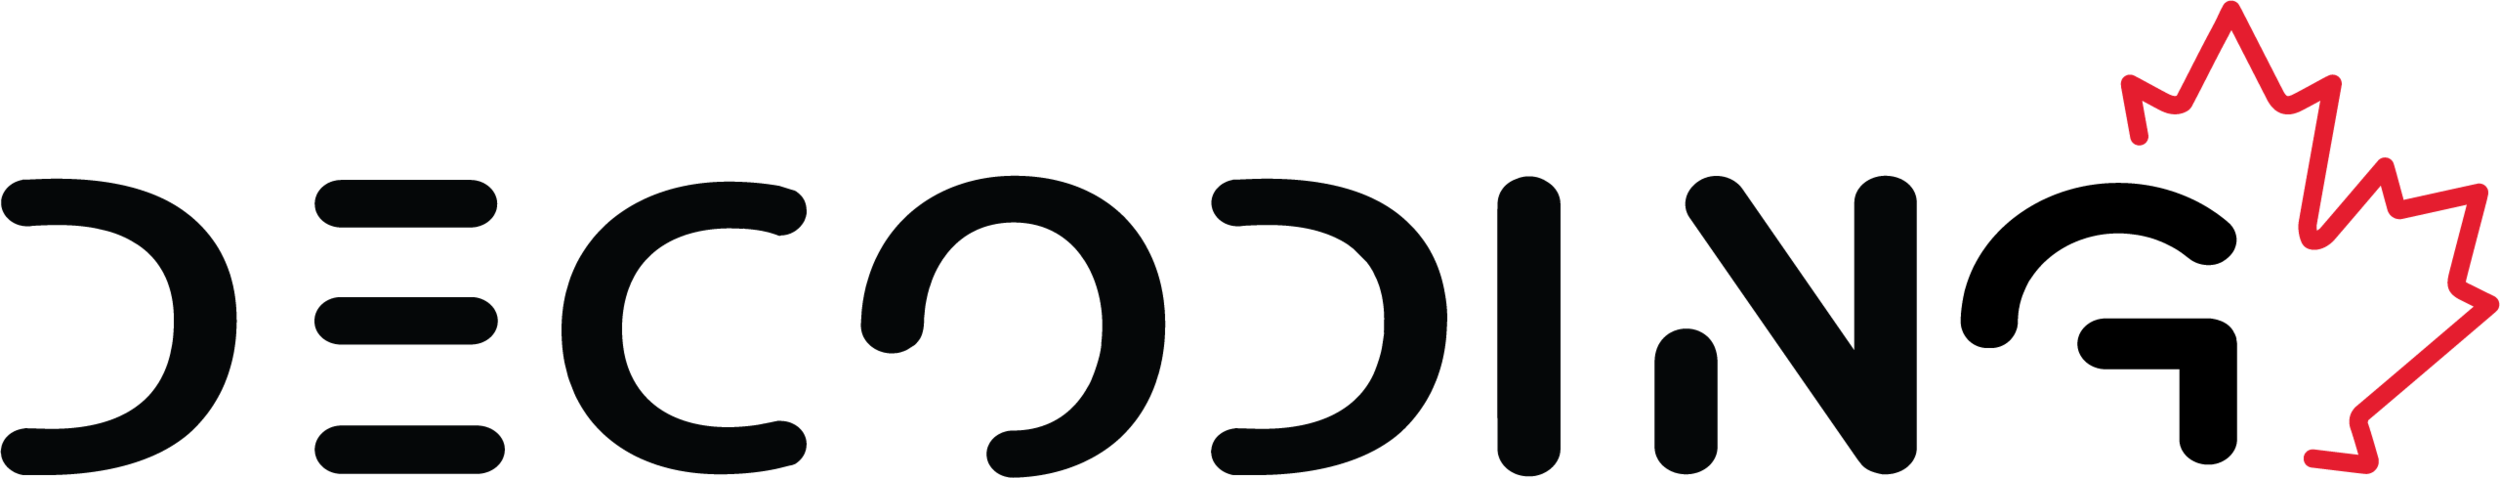 Decoding_Logo_Online.png